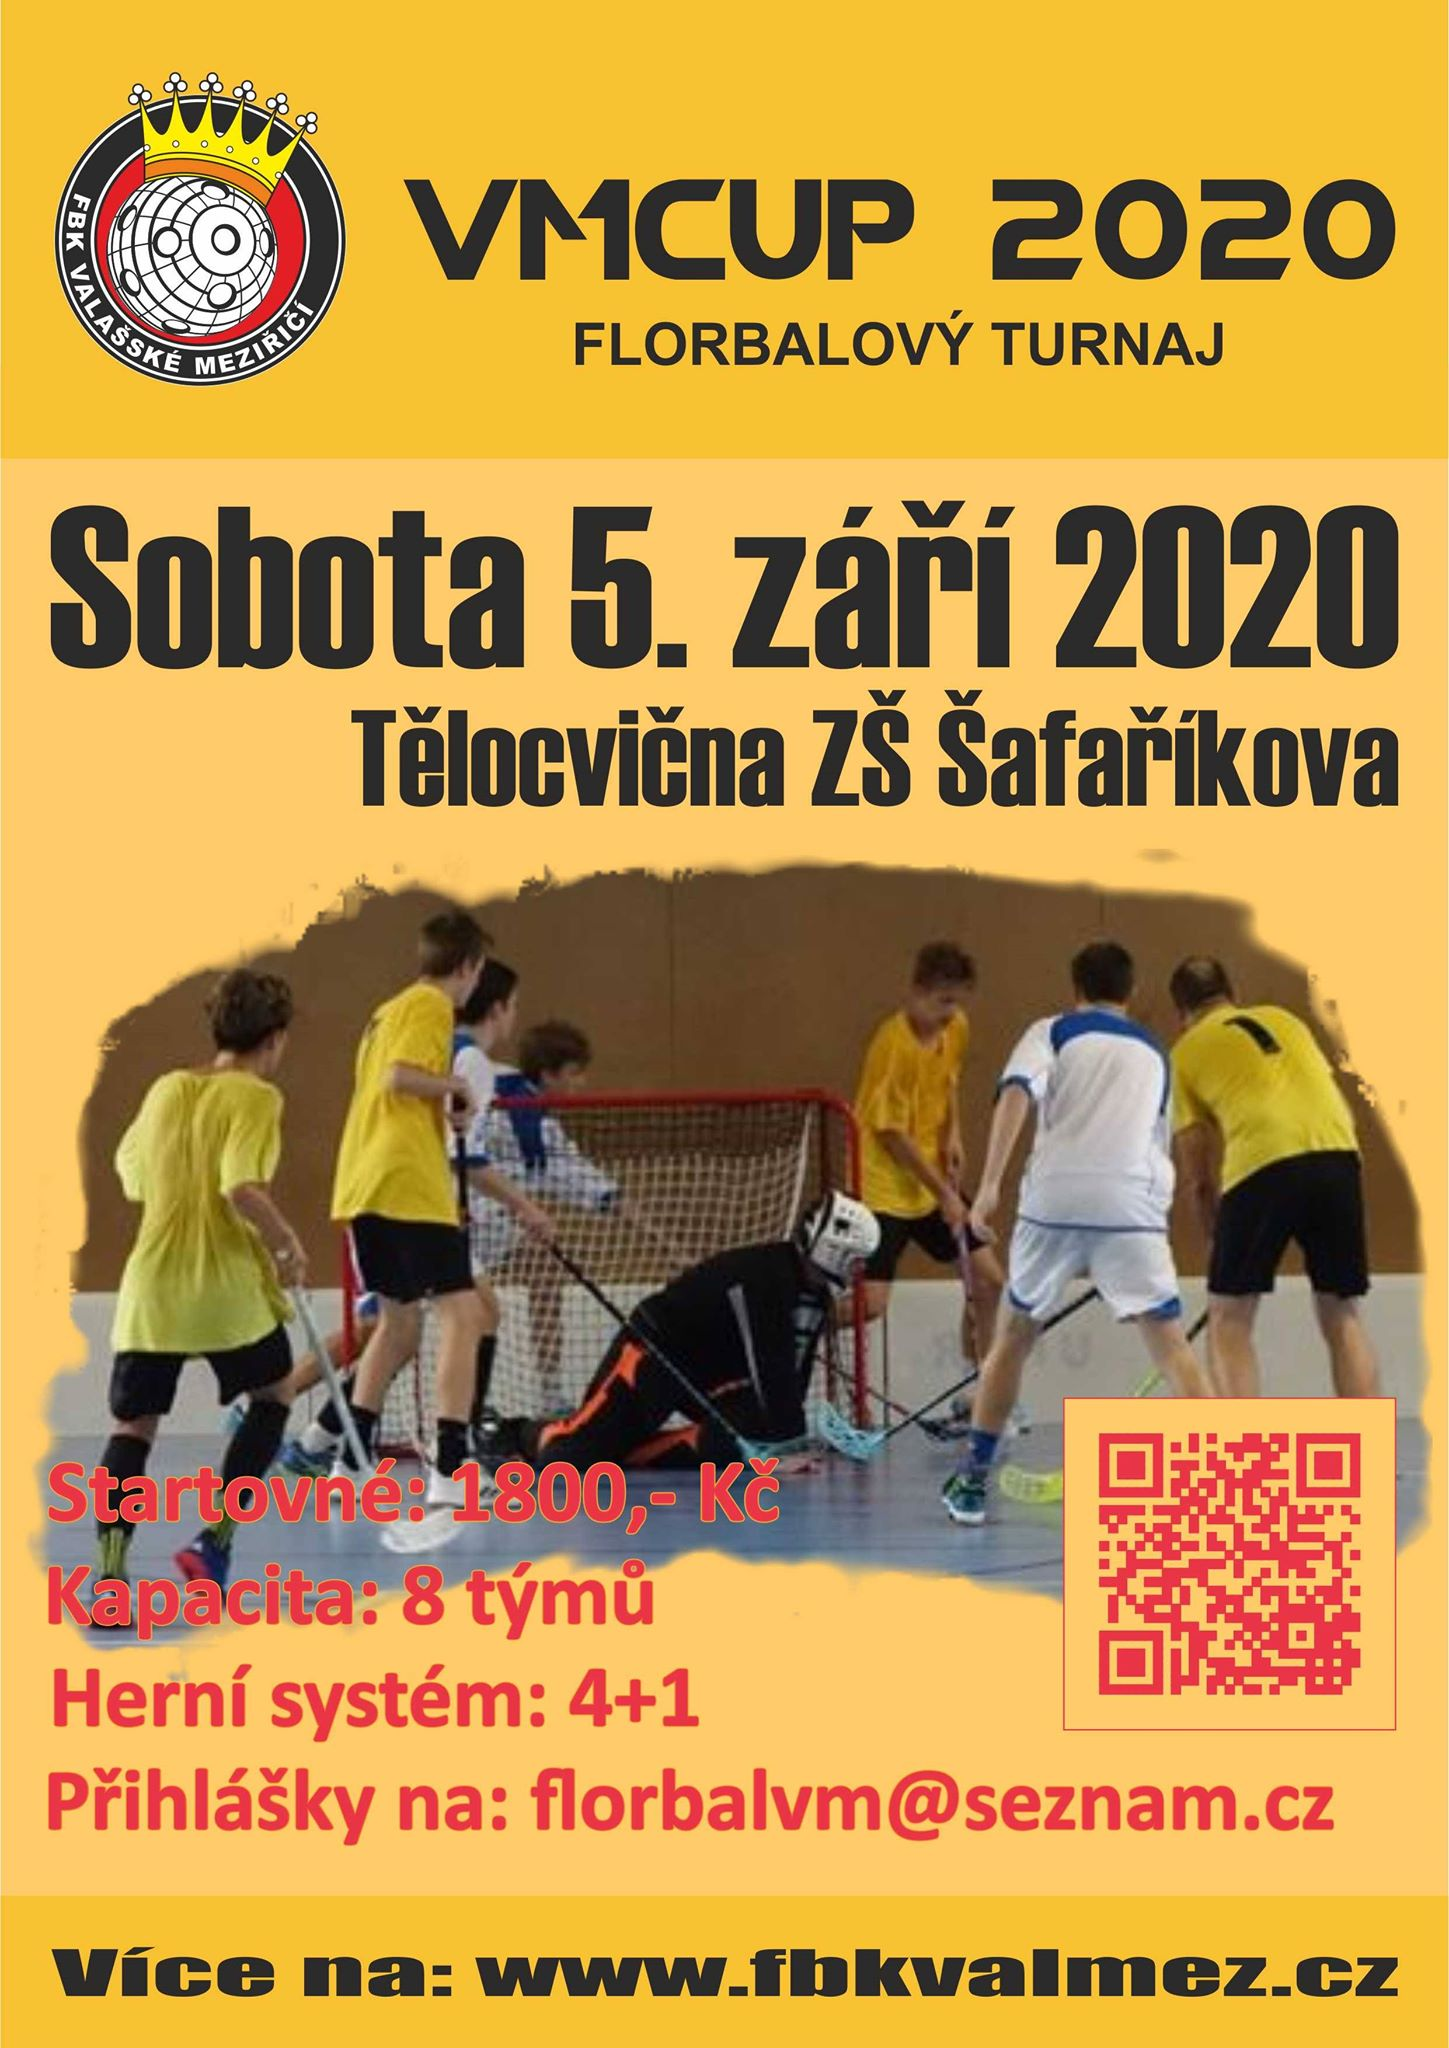 VMCUP 2020